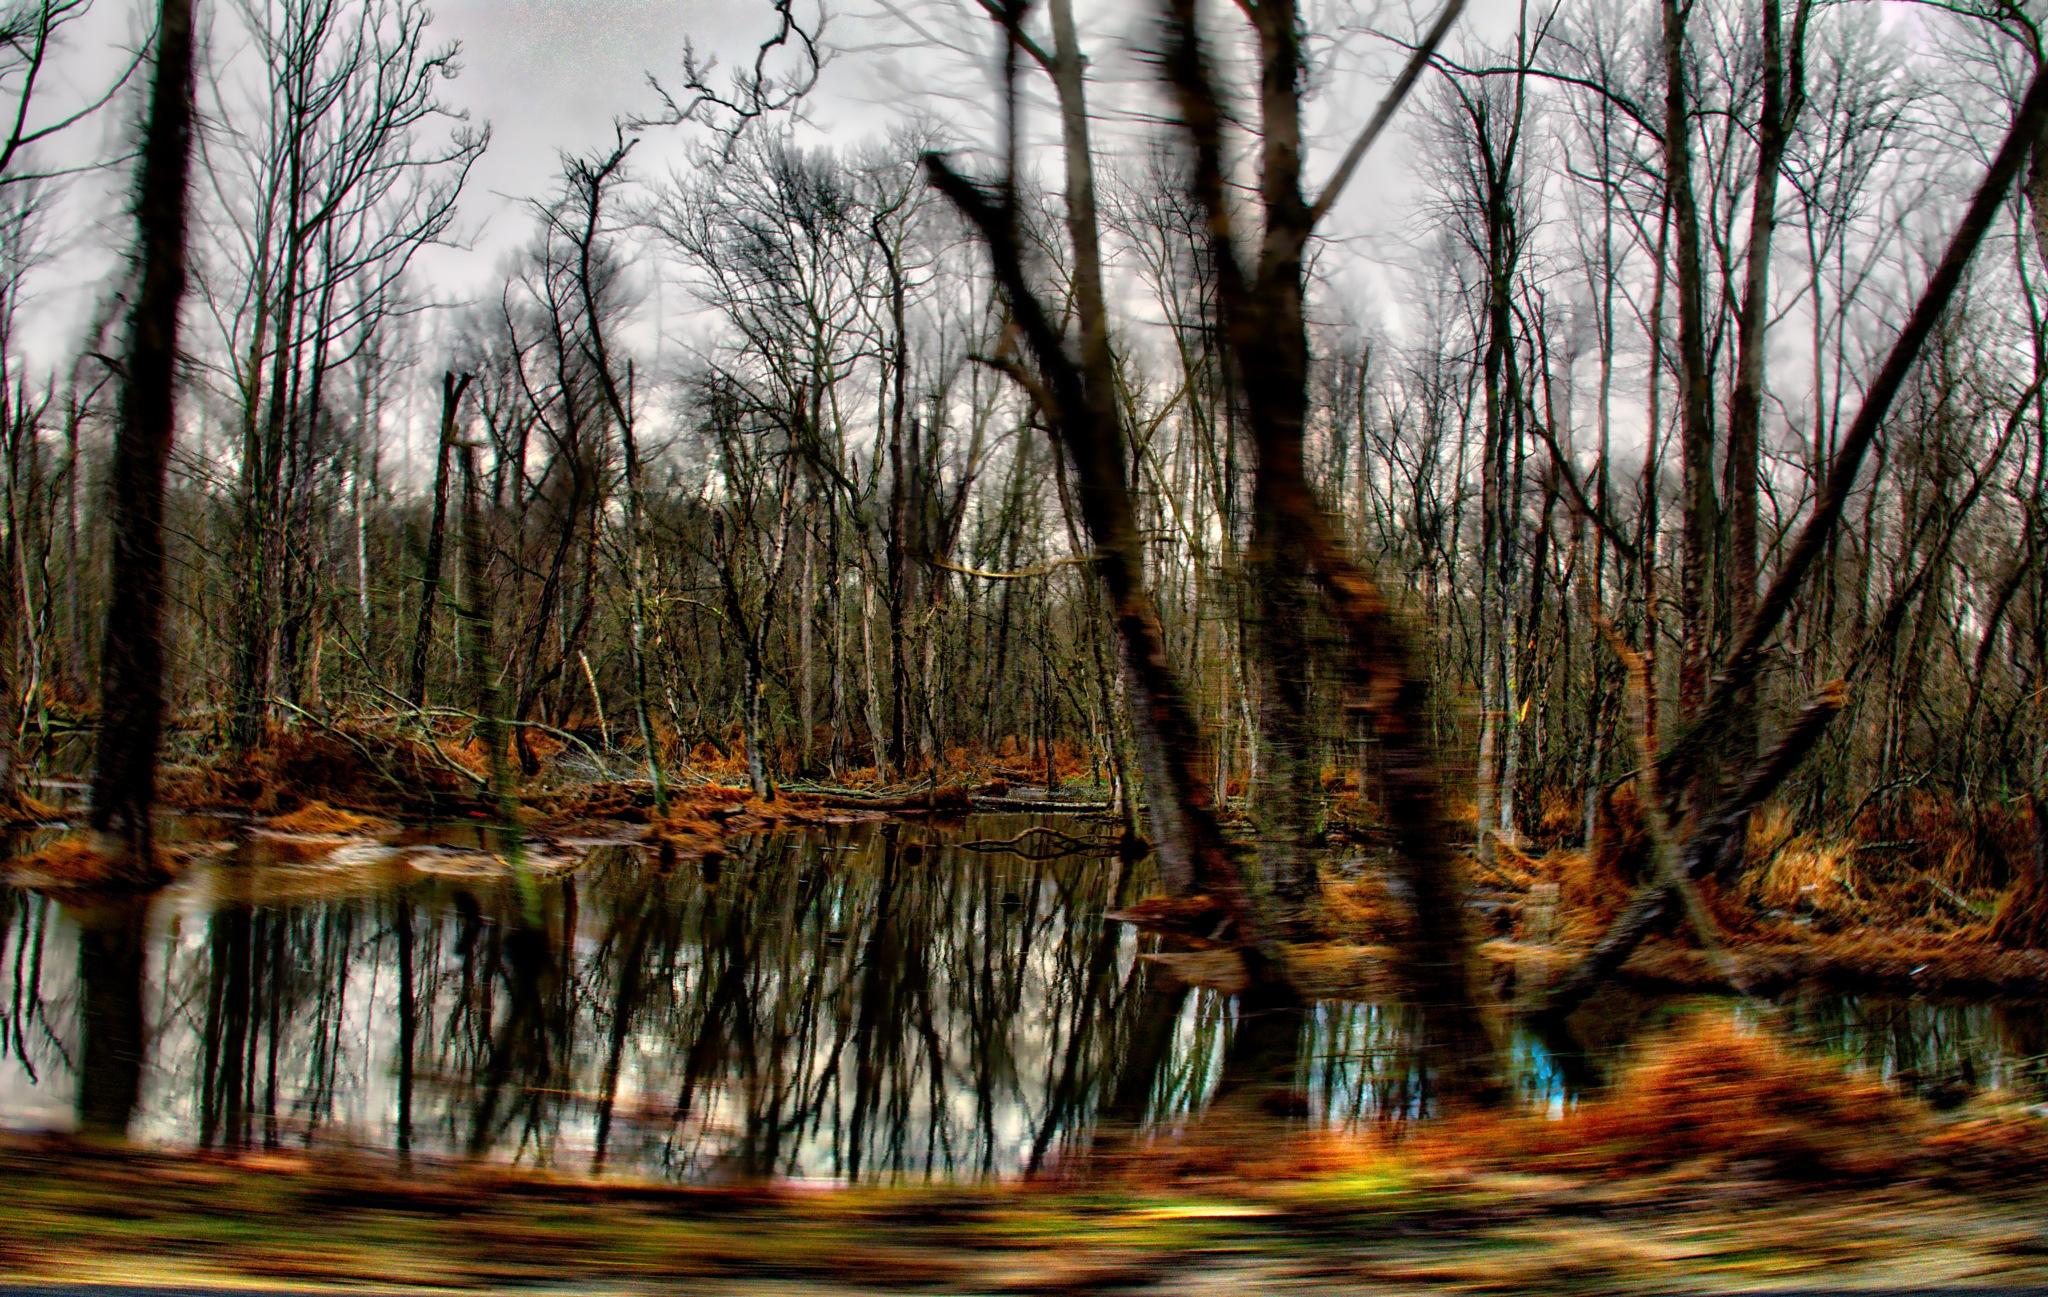 """Blurred Swamp"" by Michael  C. Habina"